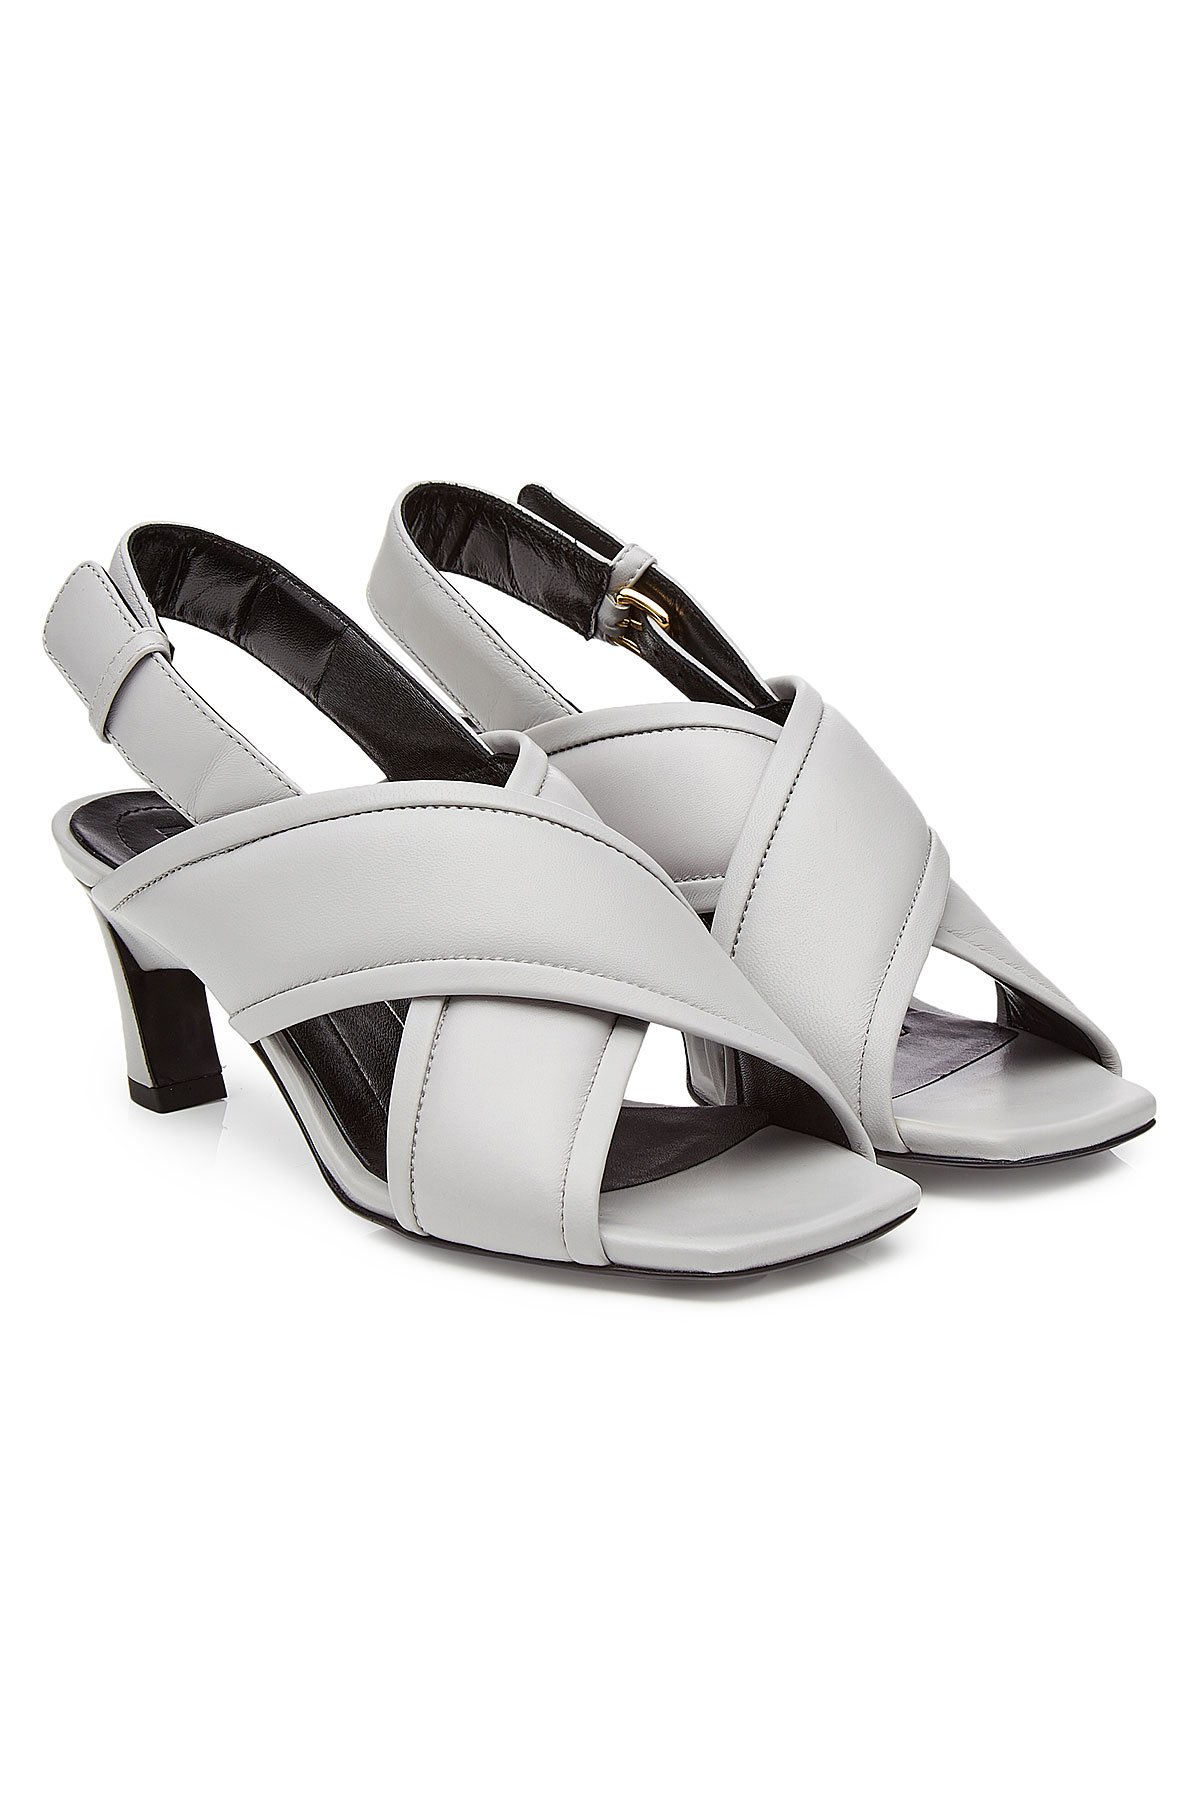 Leather Sandals Gr. EU 36